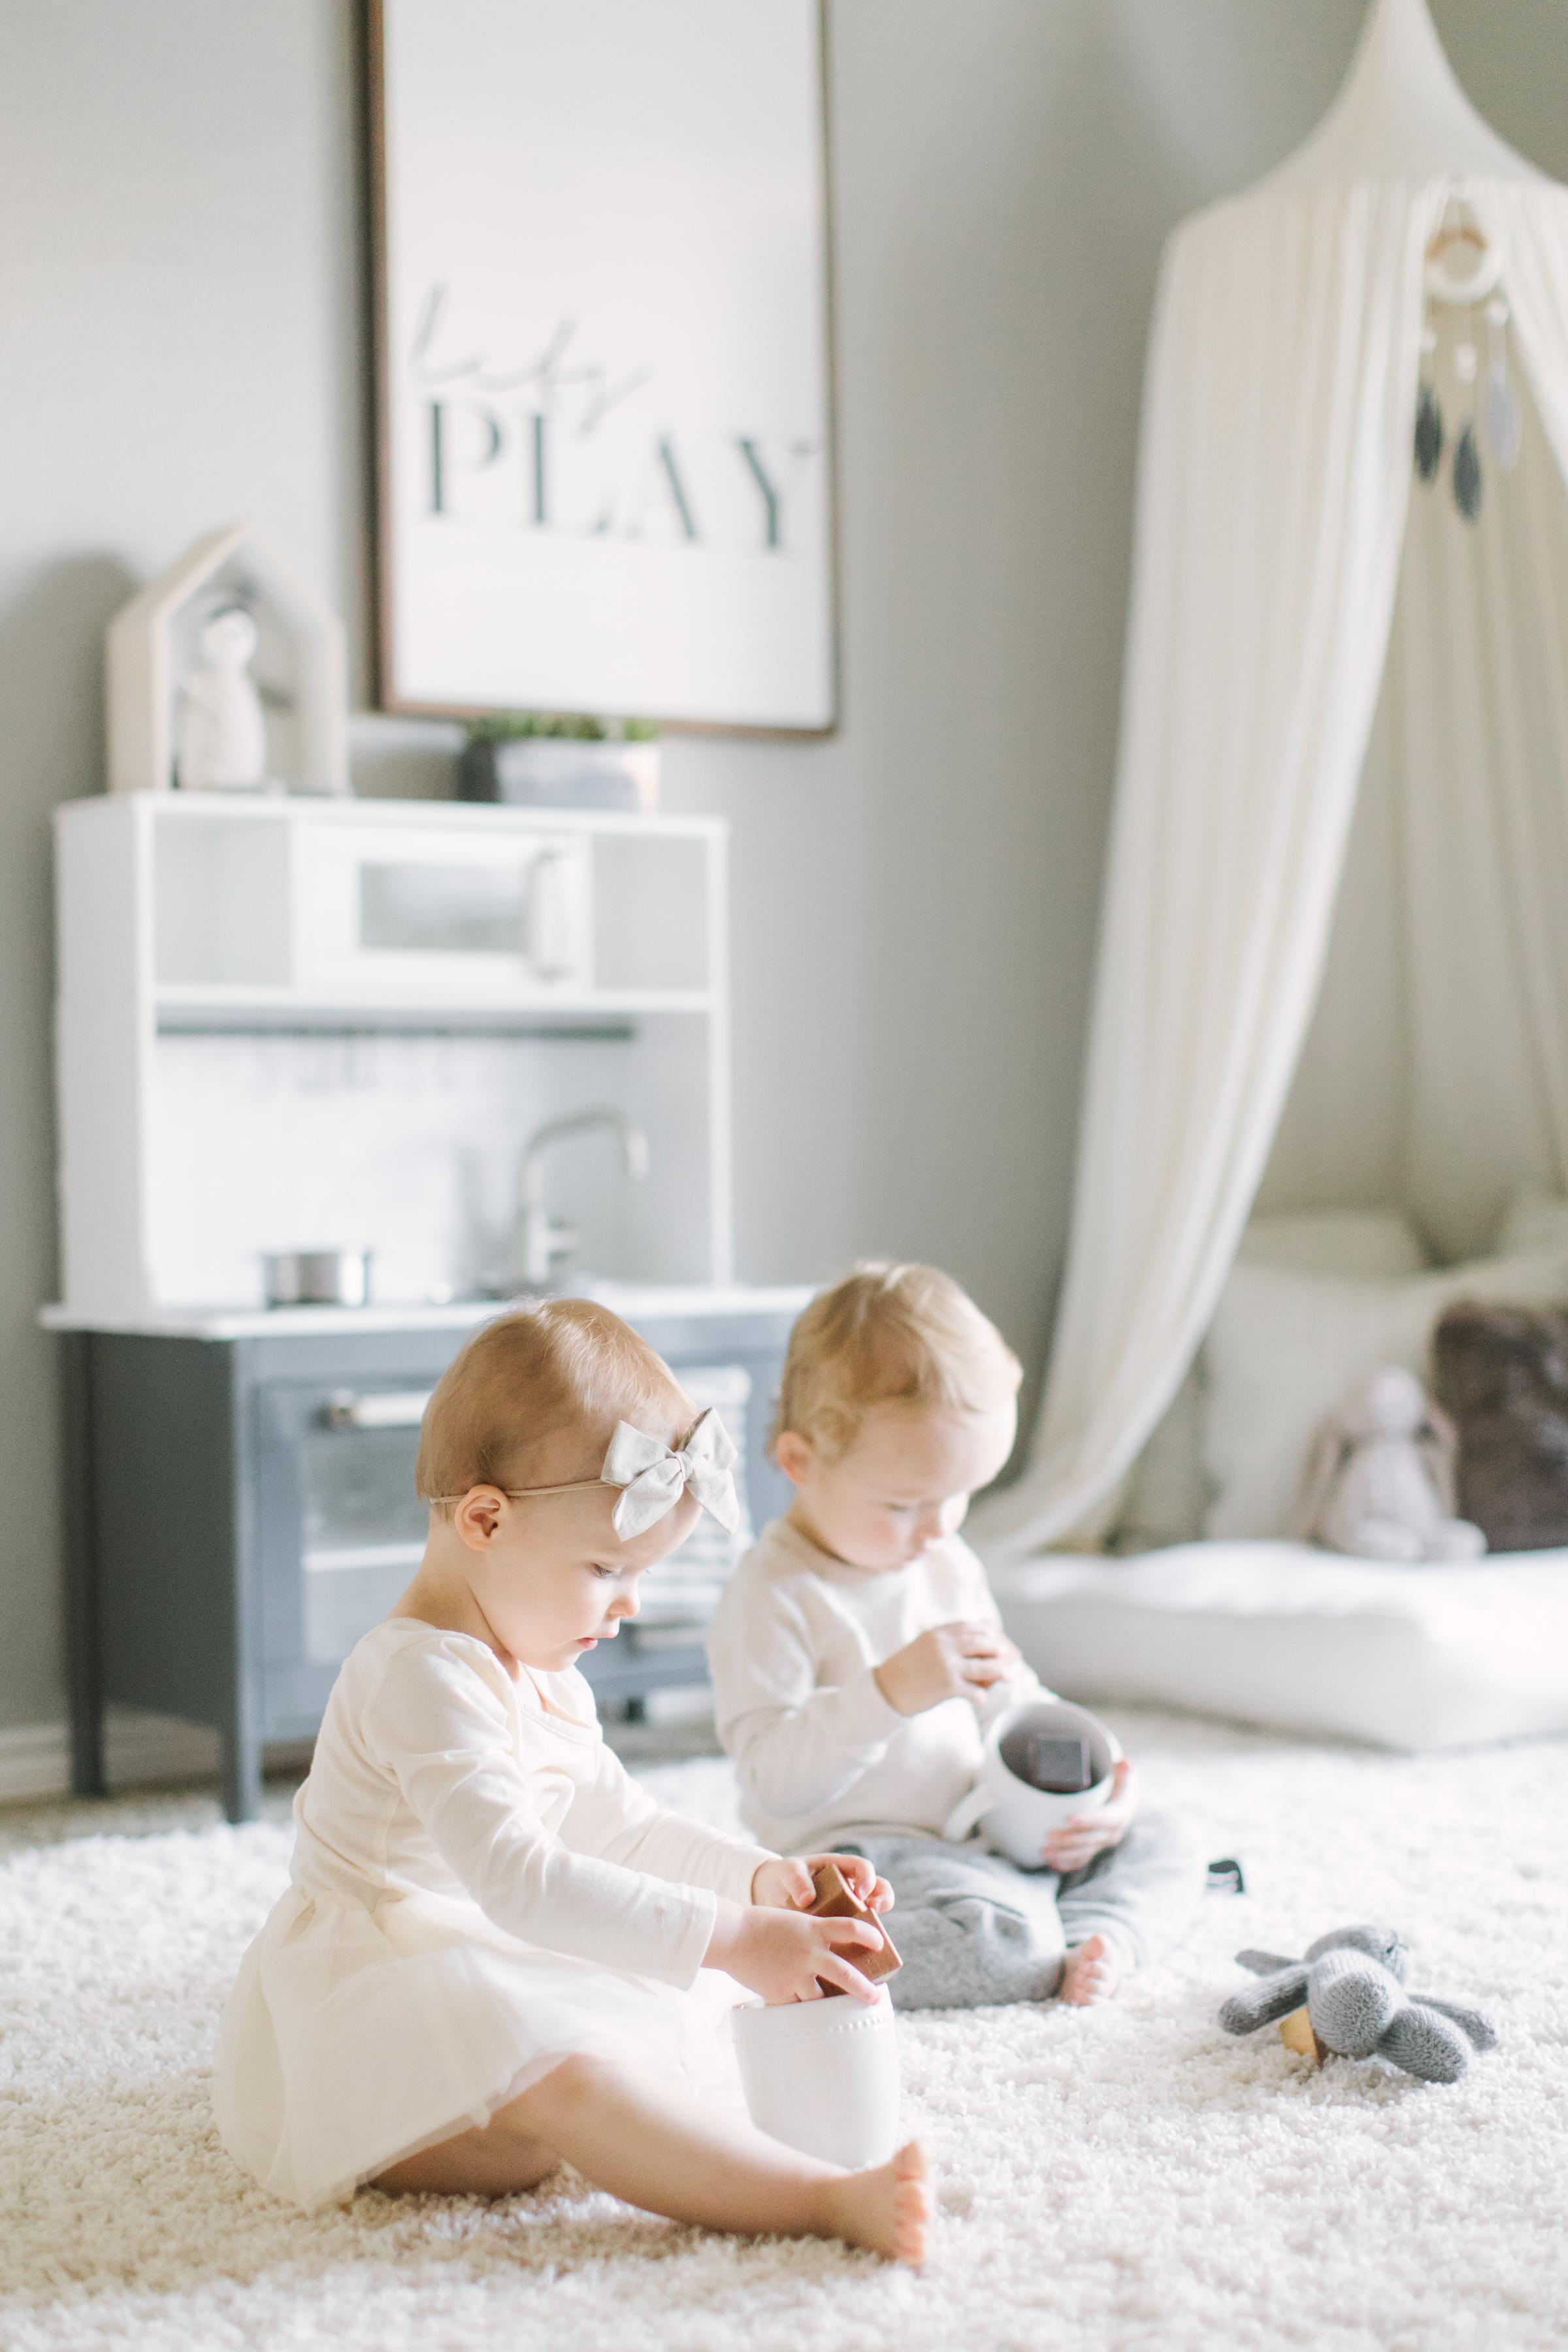 Playroom Makeover Katie Lamb Blog